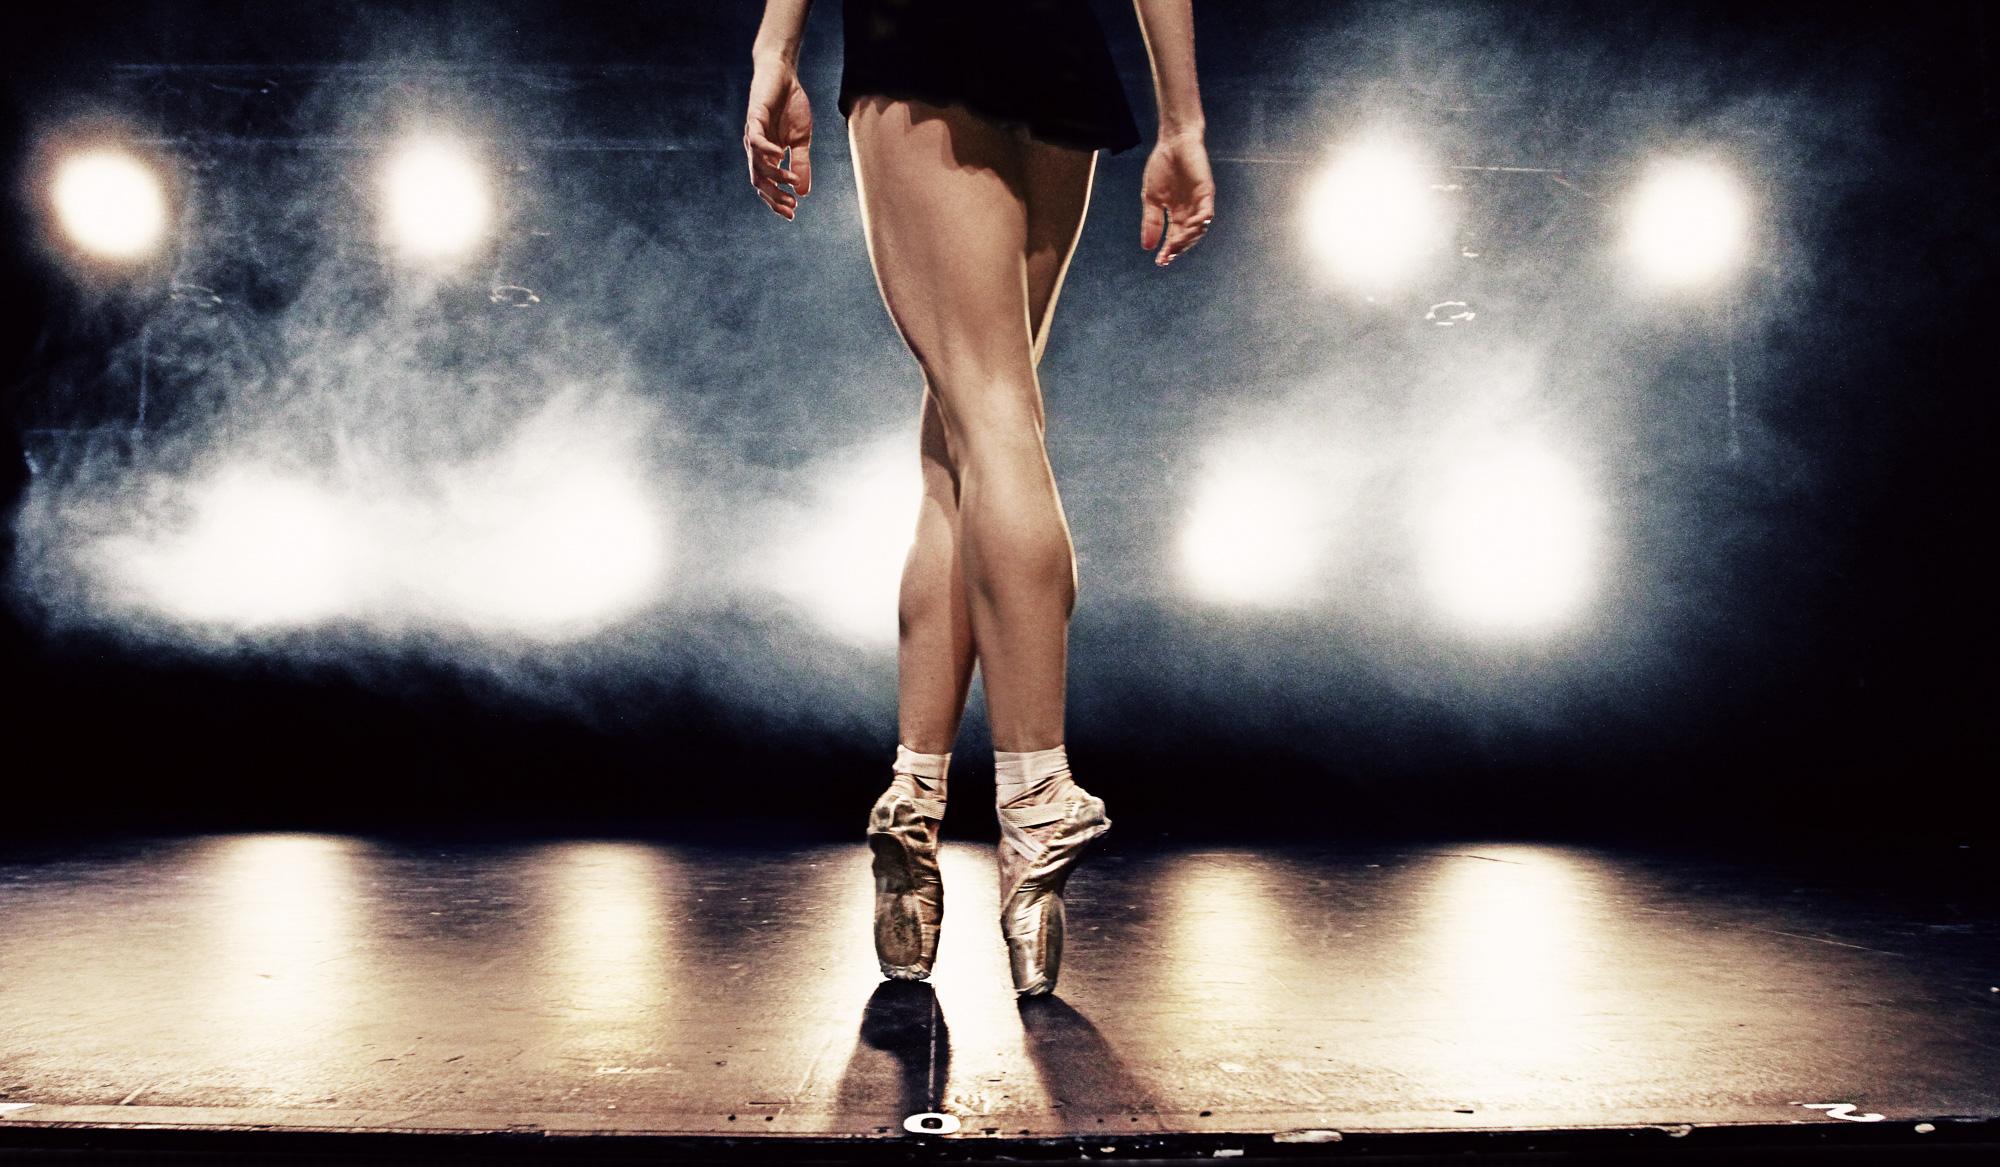 CURTISBROWNPHOTOGRAPHY_DANCE_043.JPG